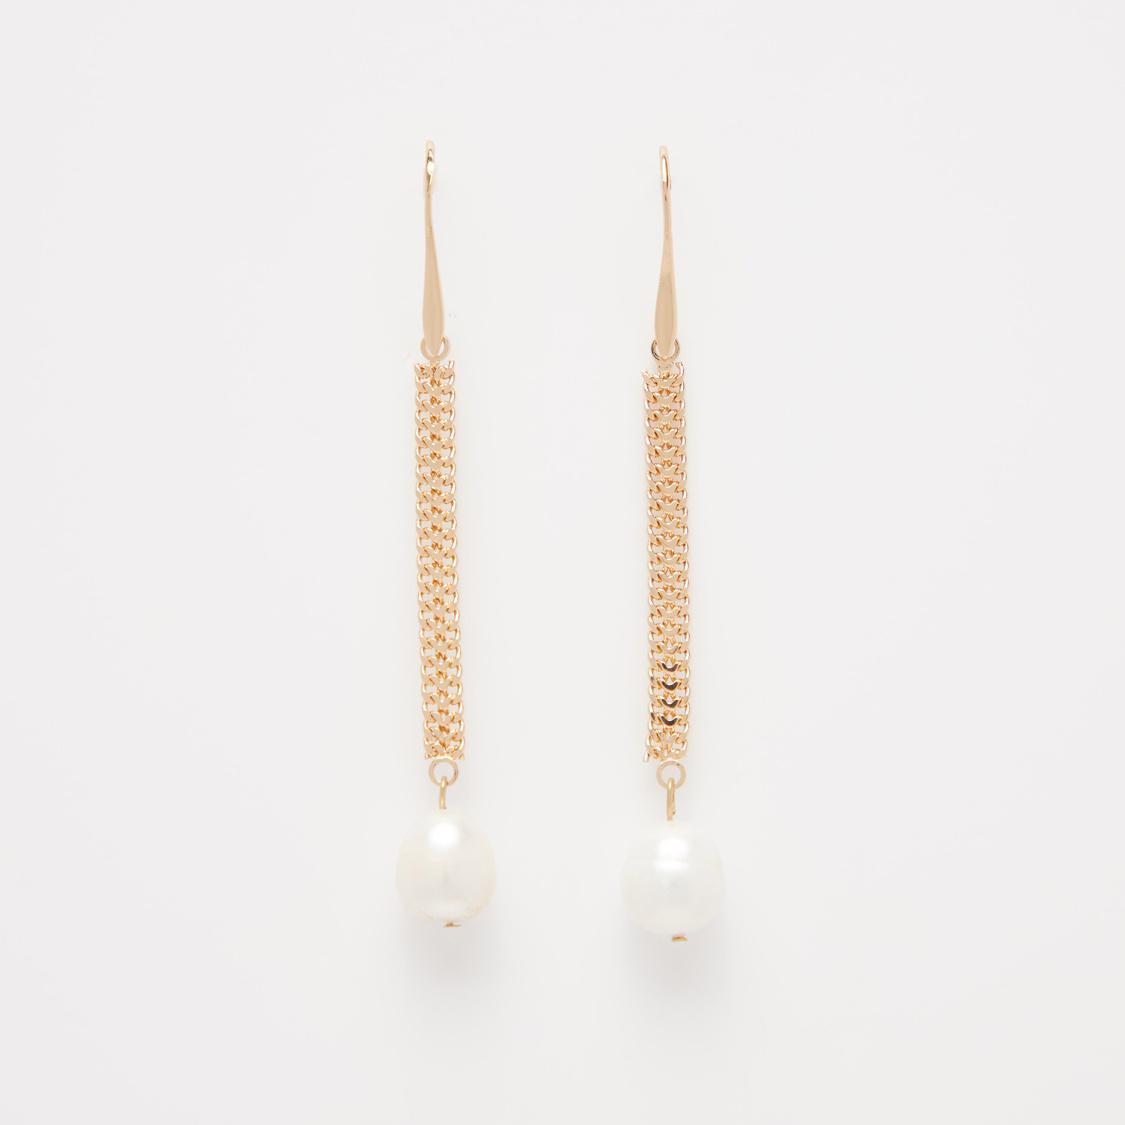 Fish Hook Long Dangler Earrings